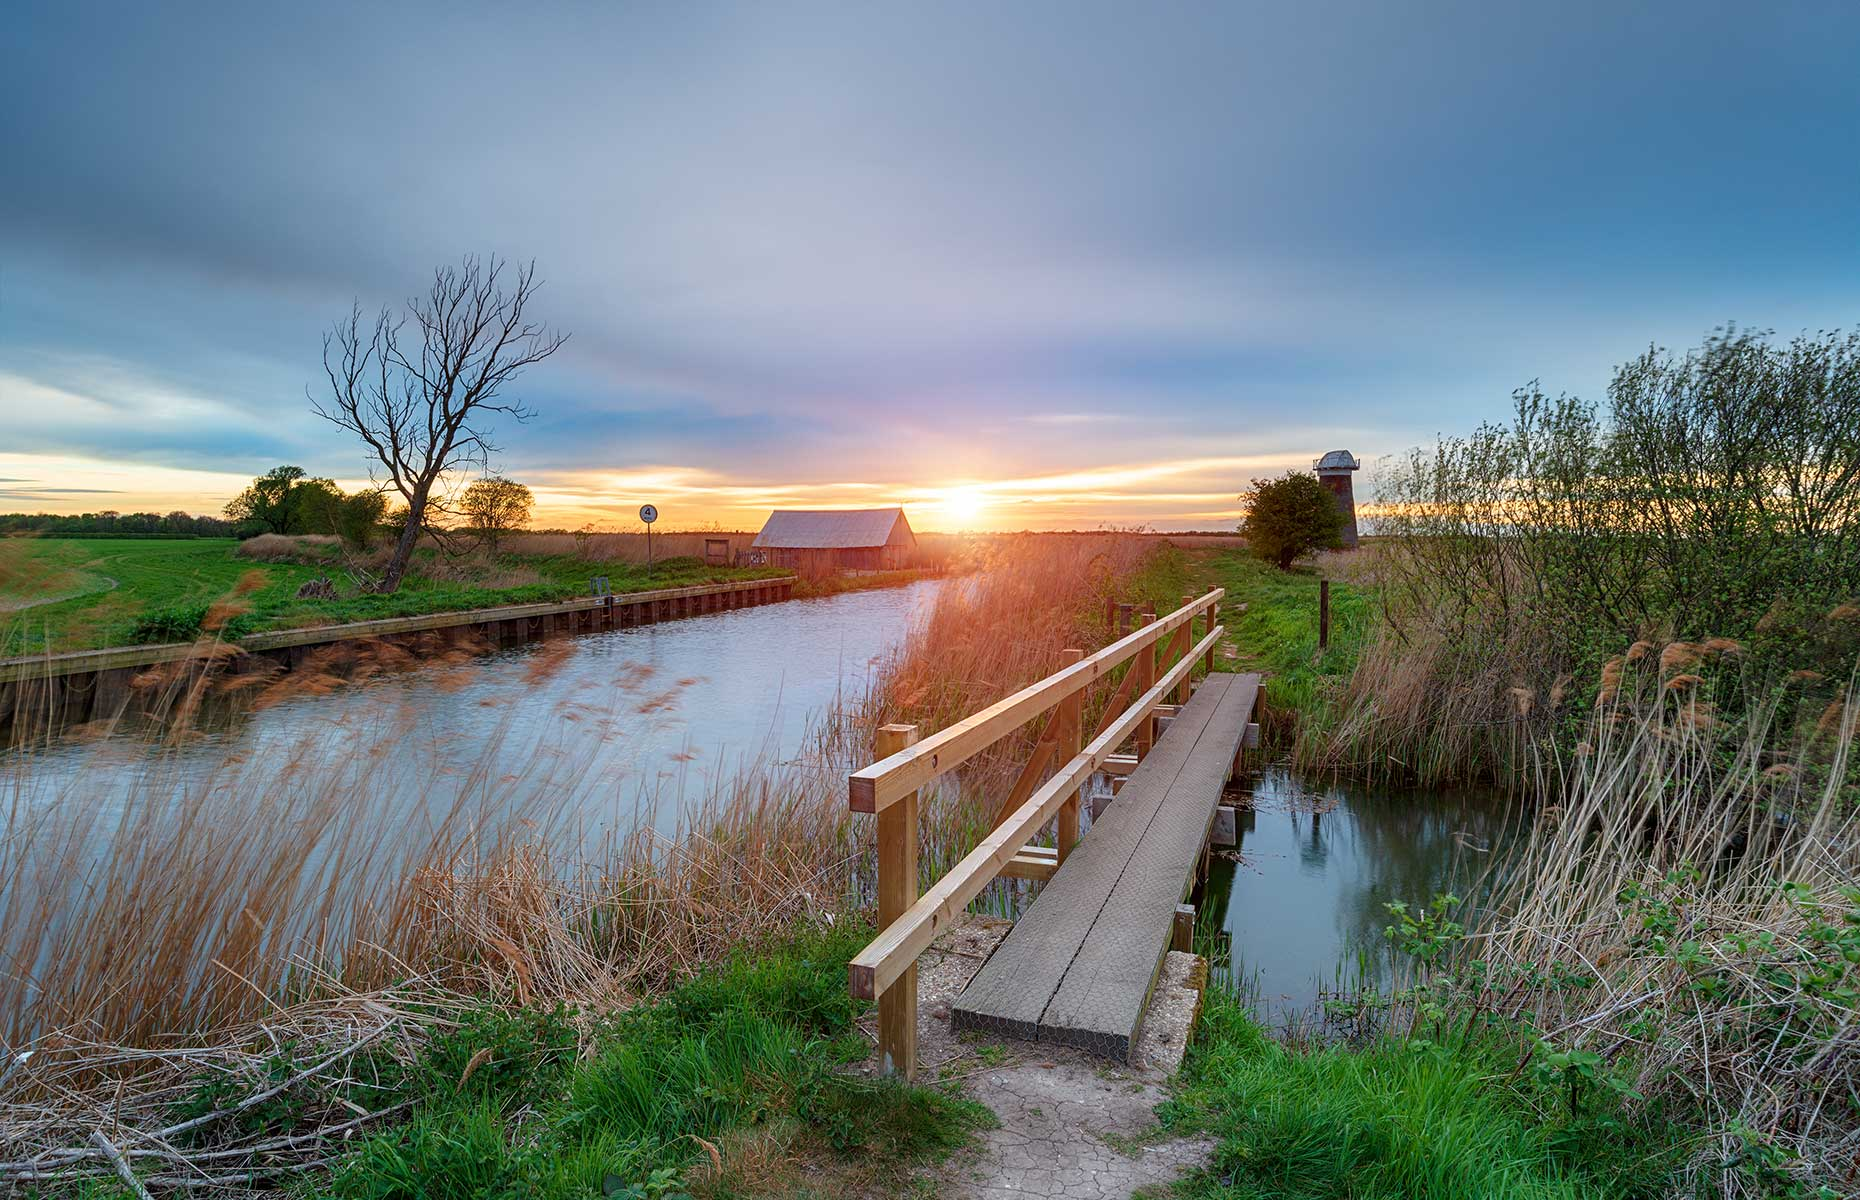 Martham Broad (Image: Helen Hotson/Shutterstock)